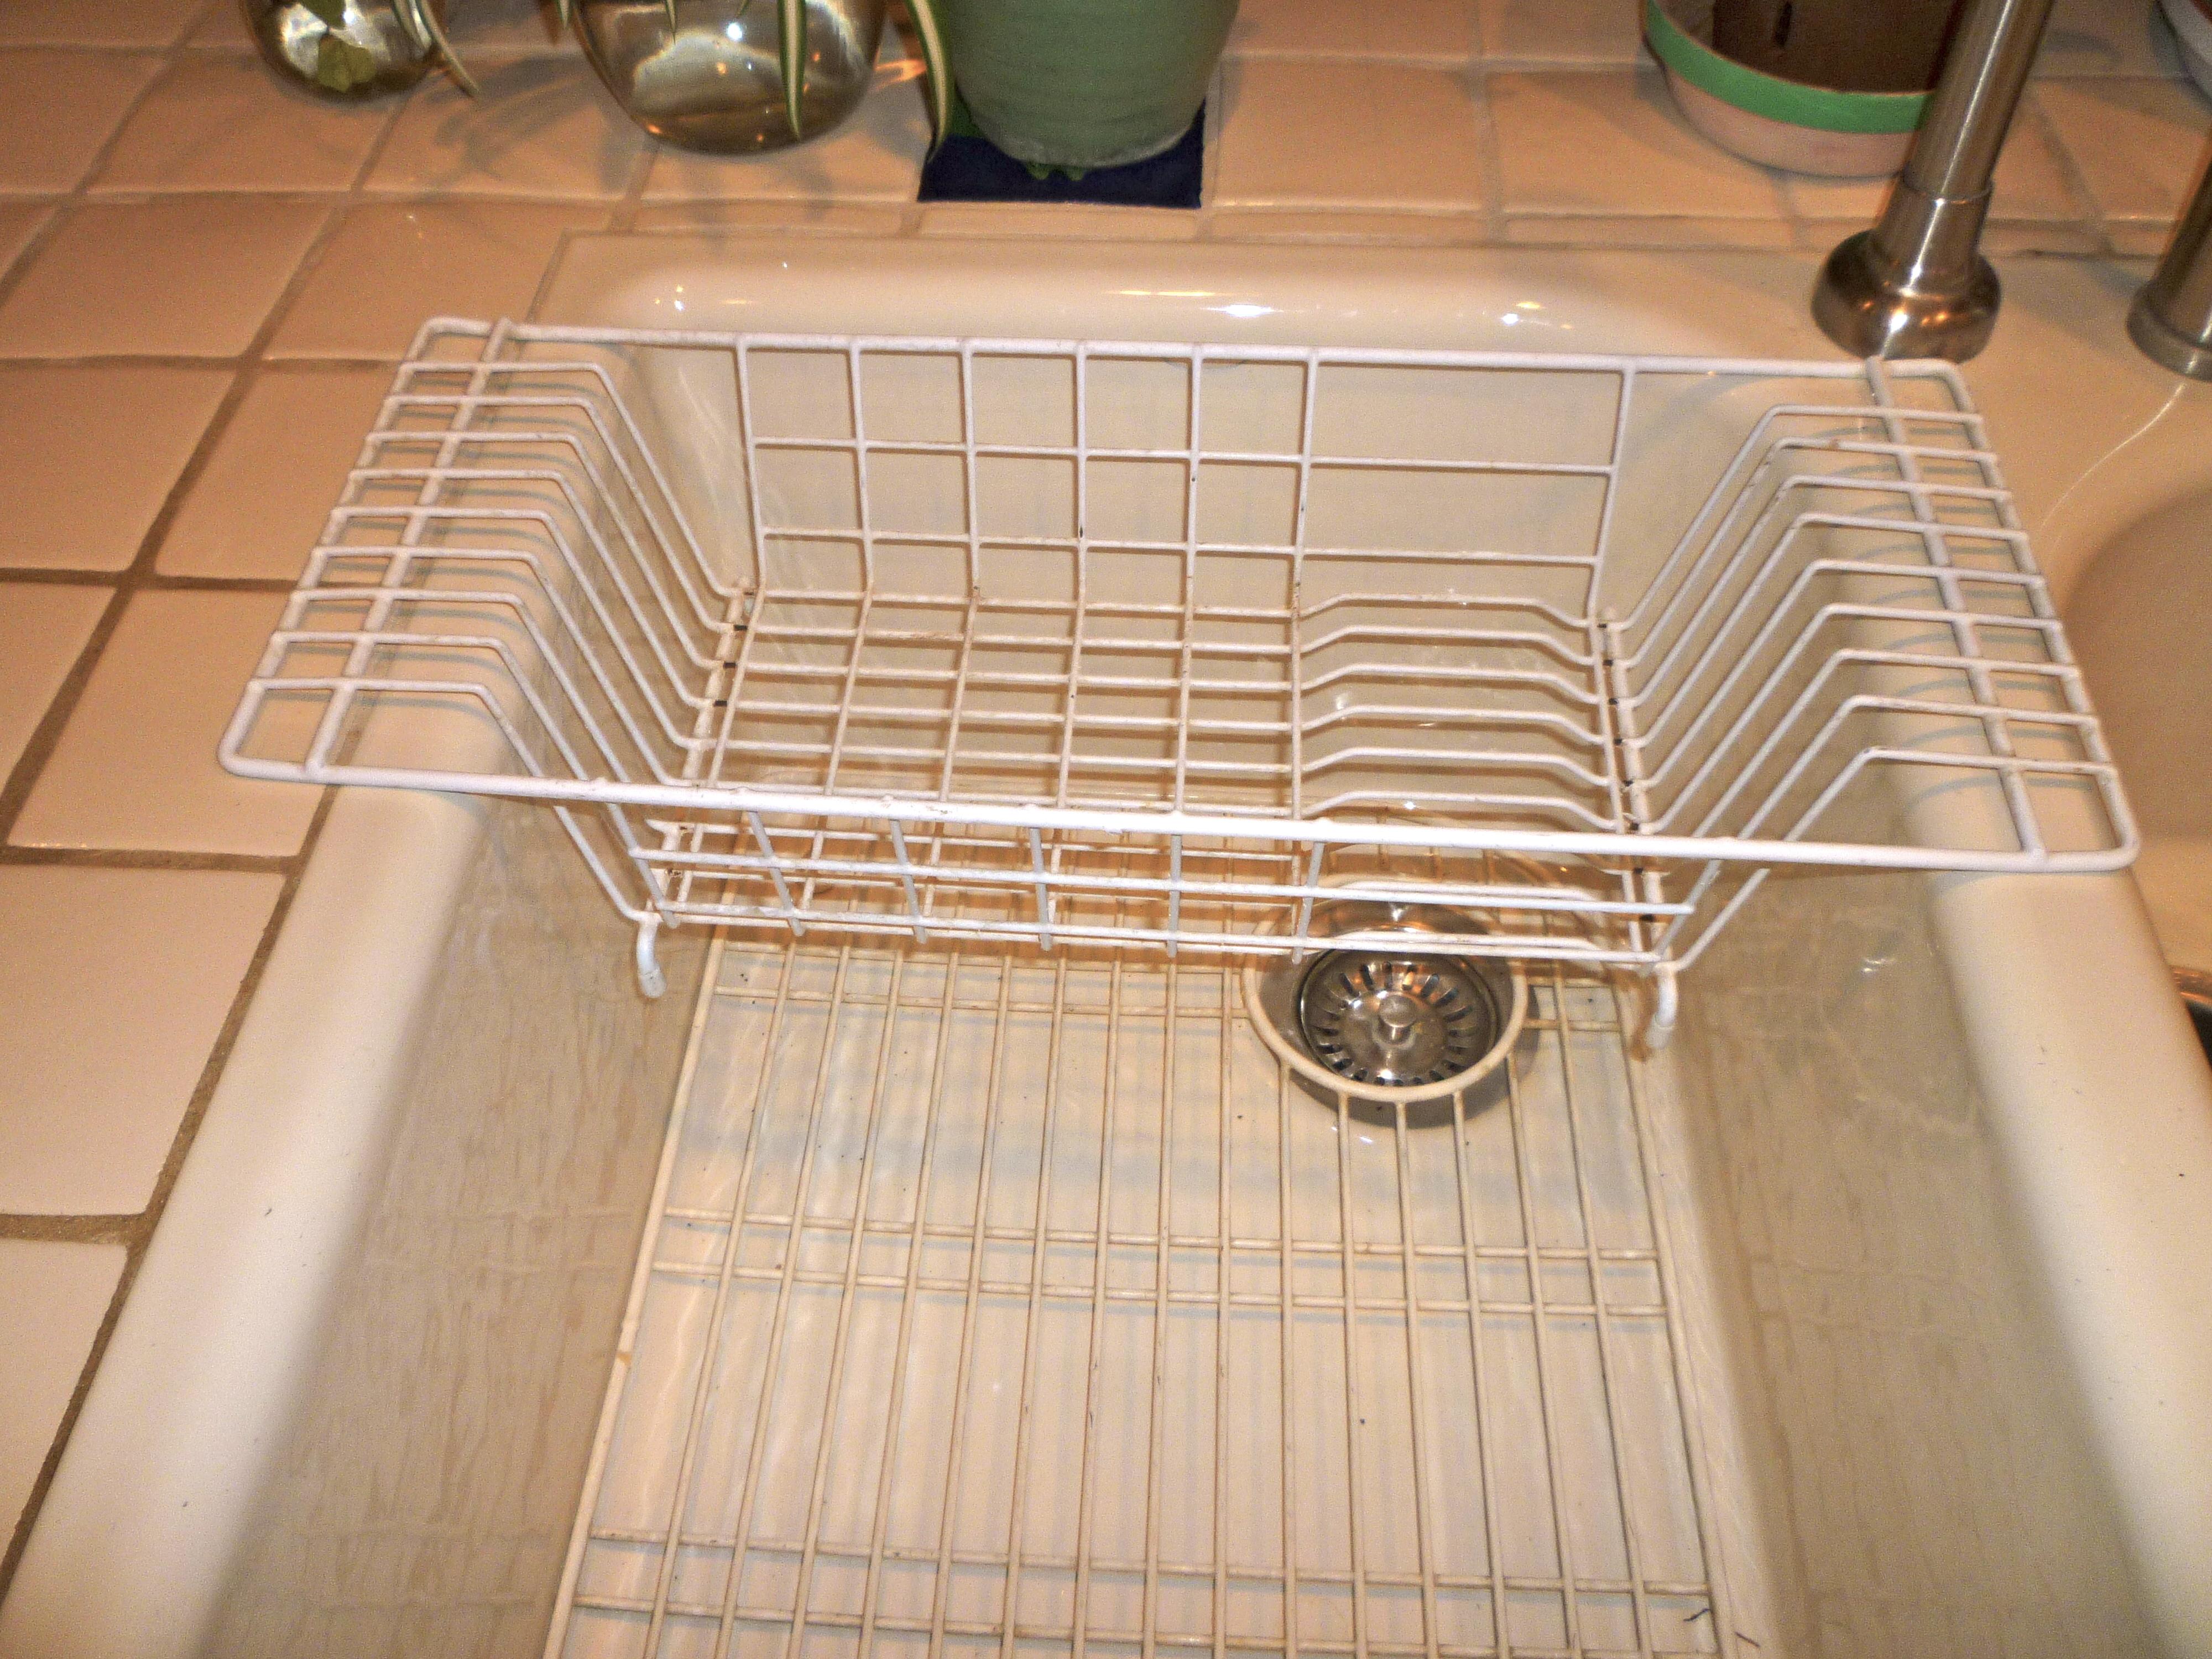 Impressive Drying Rack Dinnerware Set Dish Dryer Kitchen. Kitchen Sink Dish  Drainer Inspirational Racks Stainless Shape Gri